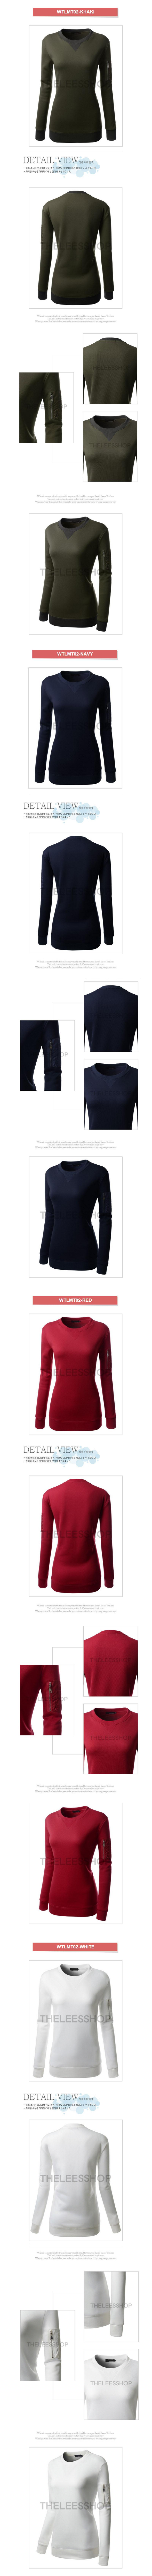 [ KOOLLOOK ] [ KoolLook ]男女皆宜的圆领超轻毛皮运动衫 WTLMT02